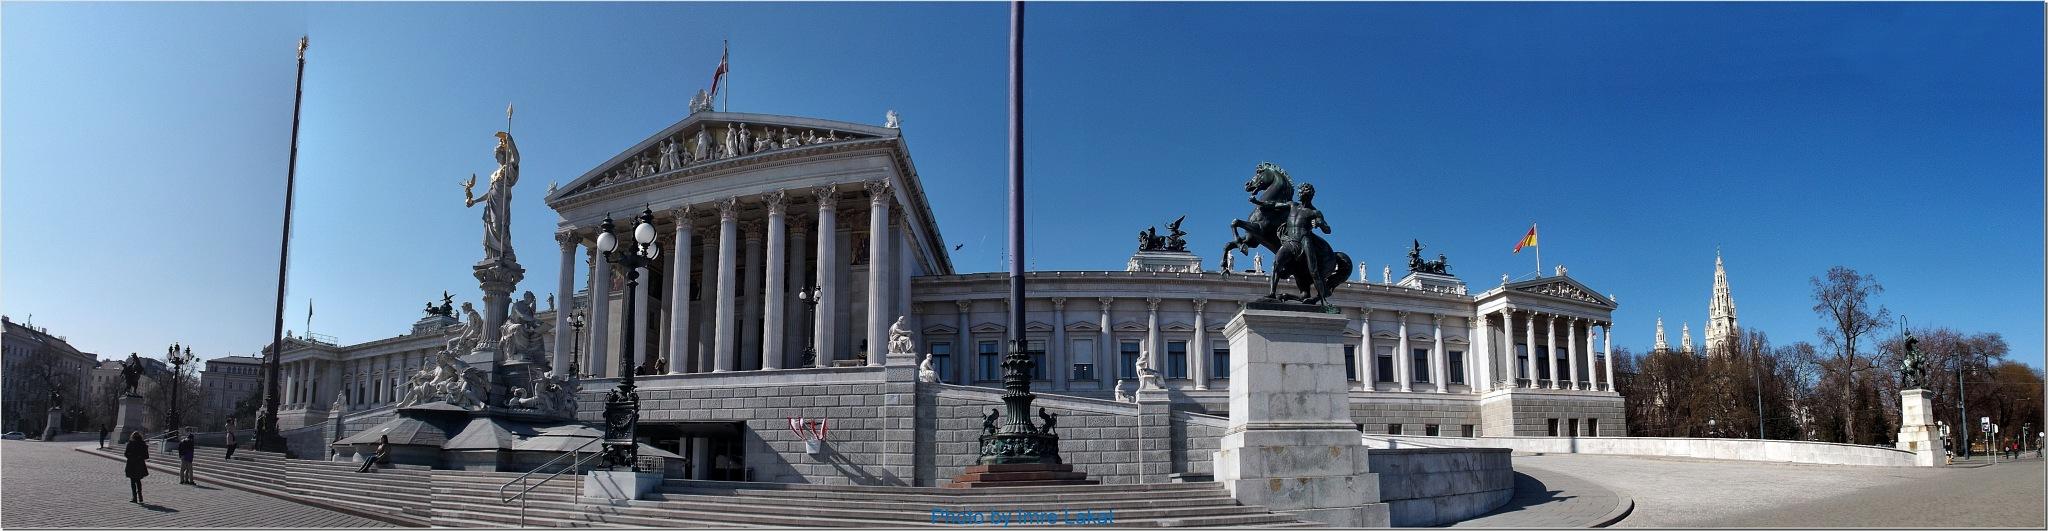 Parliament ...Doktor-Karl-Renner-Ring 3, 1010 Wien, Ausztria  by Imre Lakat